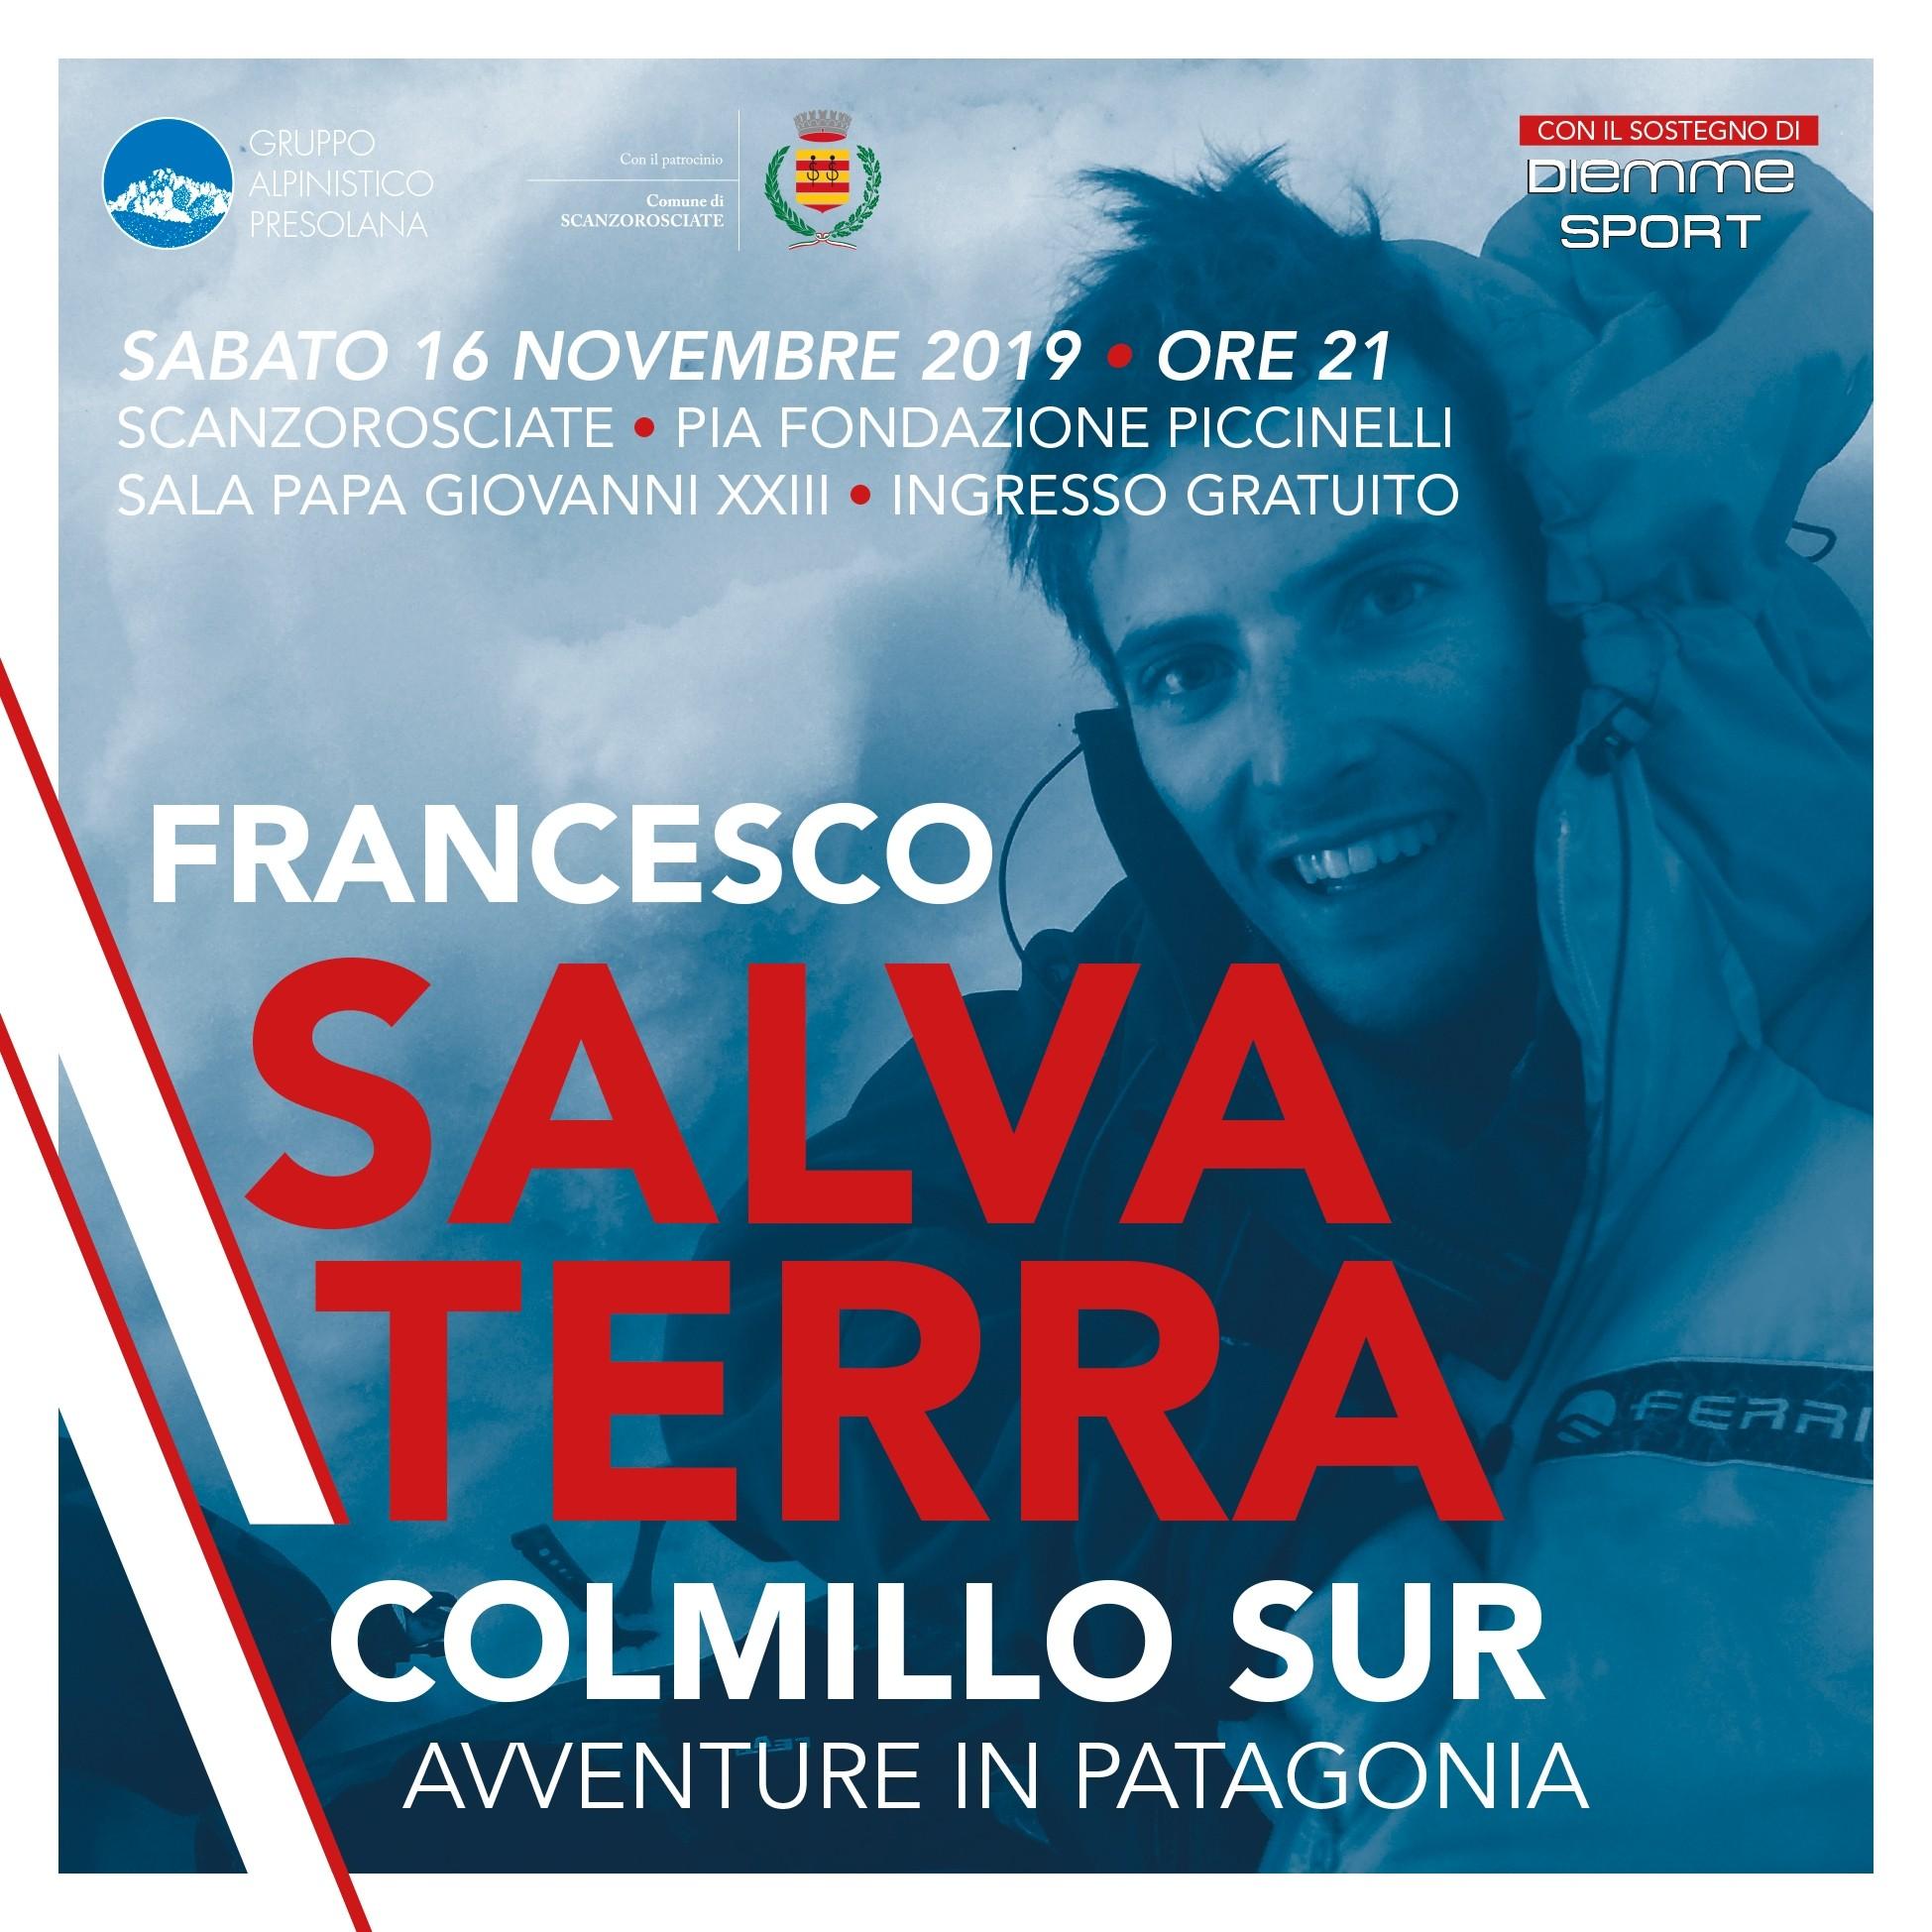 Francesco Salvaterra ospite al GAP – Sabato 16 Novembre 2019